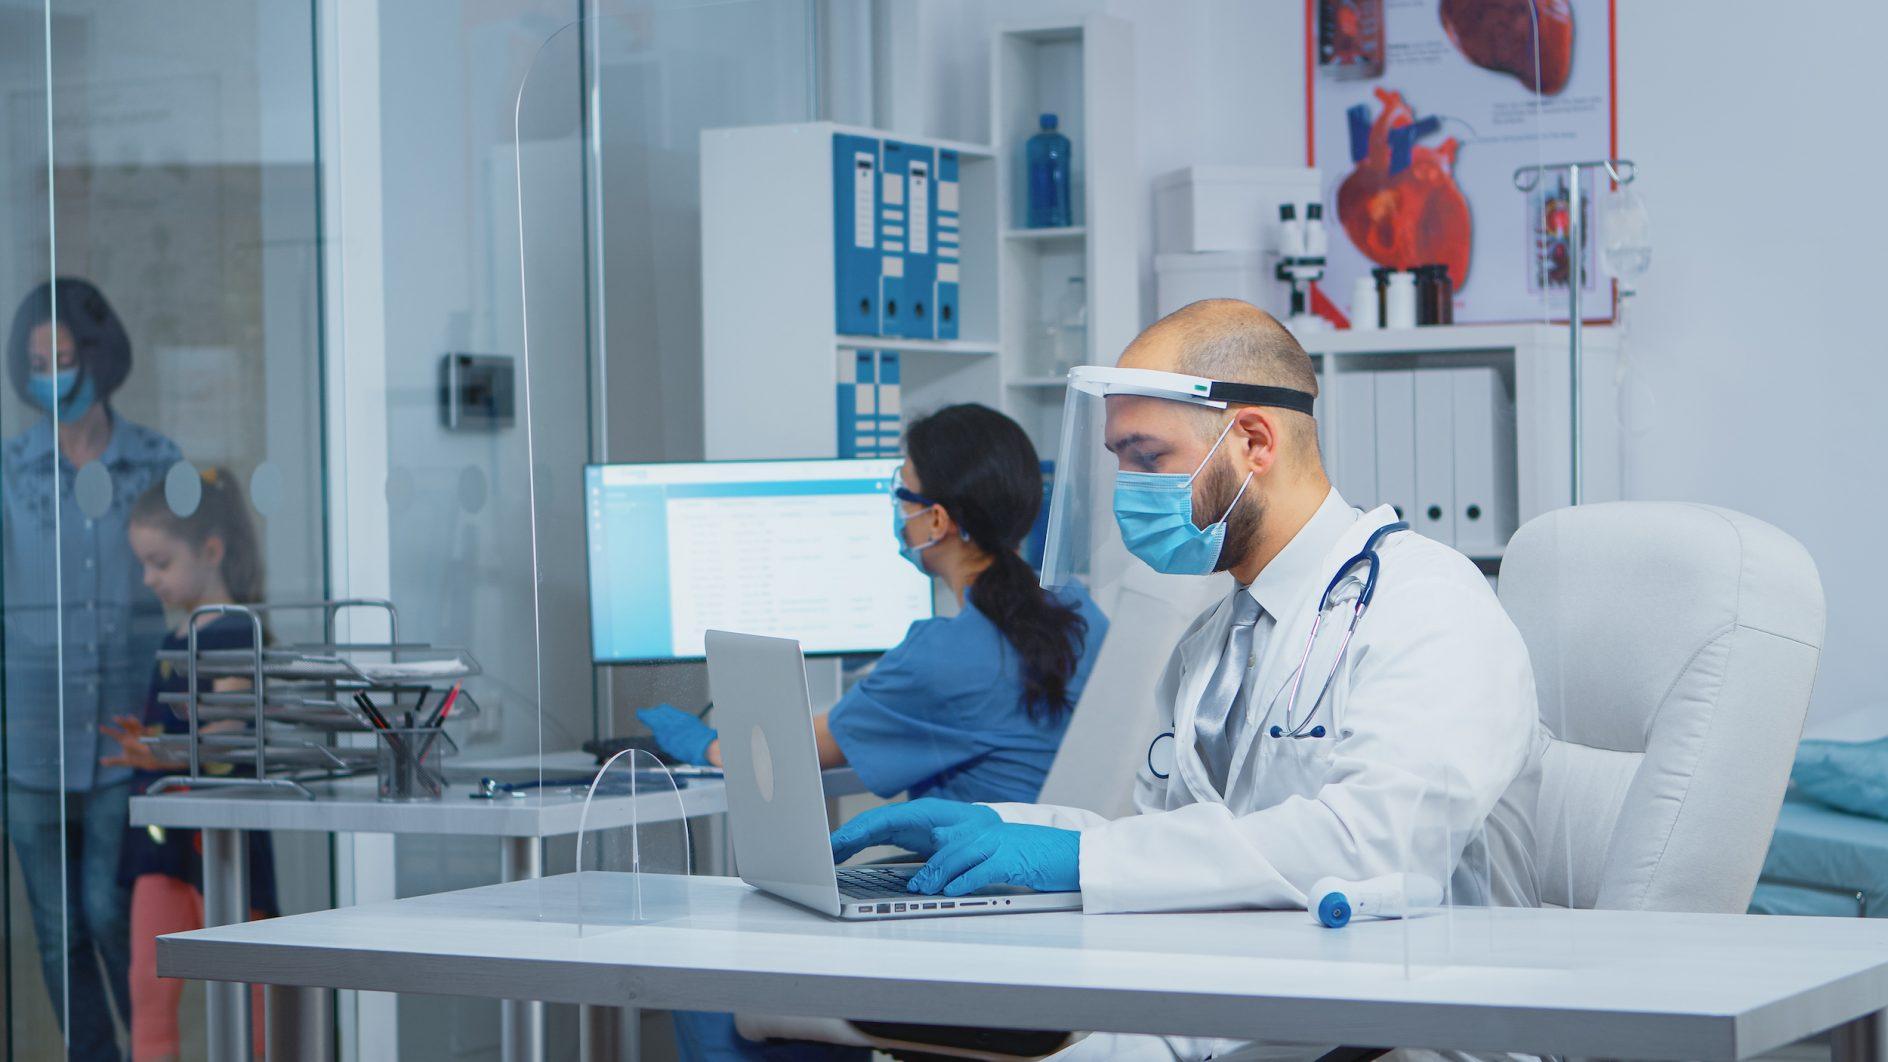 Al Wakra Hospital Launches Acute Pain Treatment Service for Surgery, Burns Patients